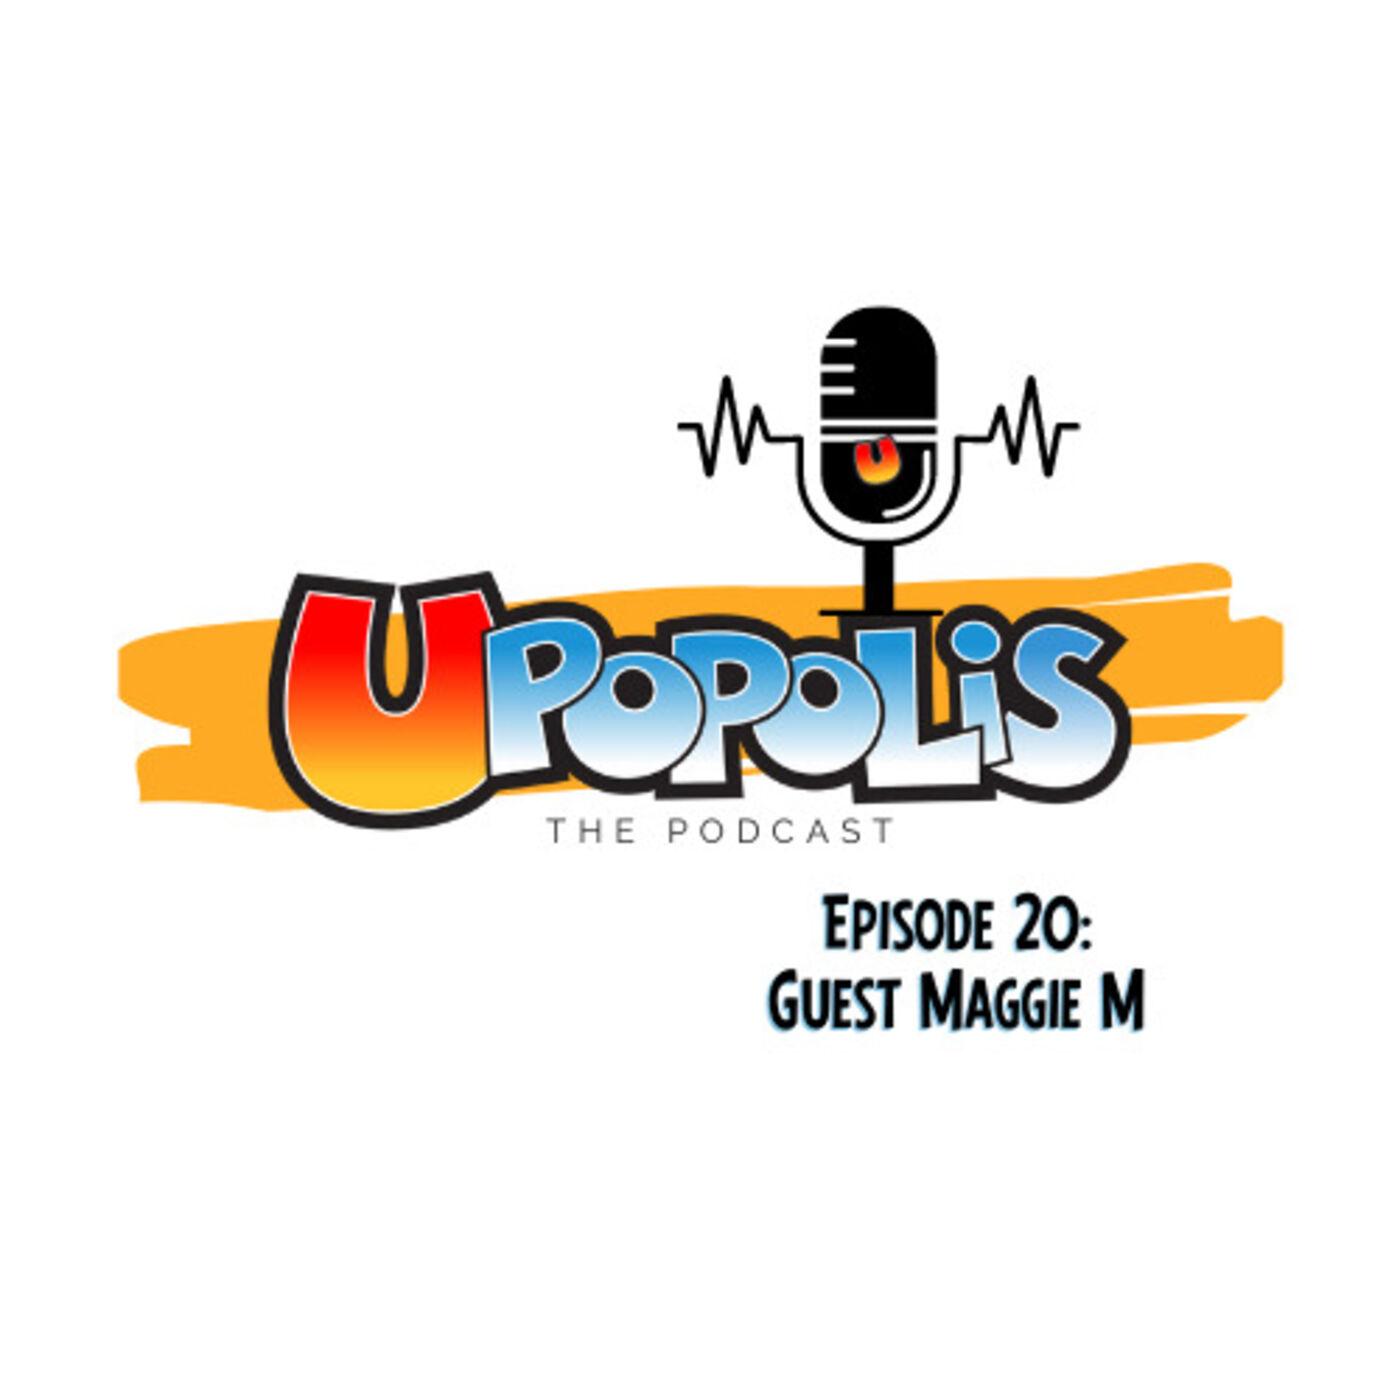 Episode 20: Guest Maggie M